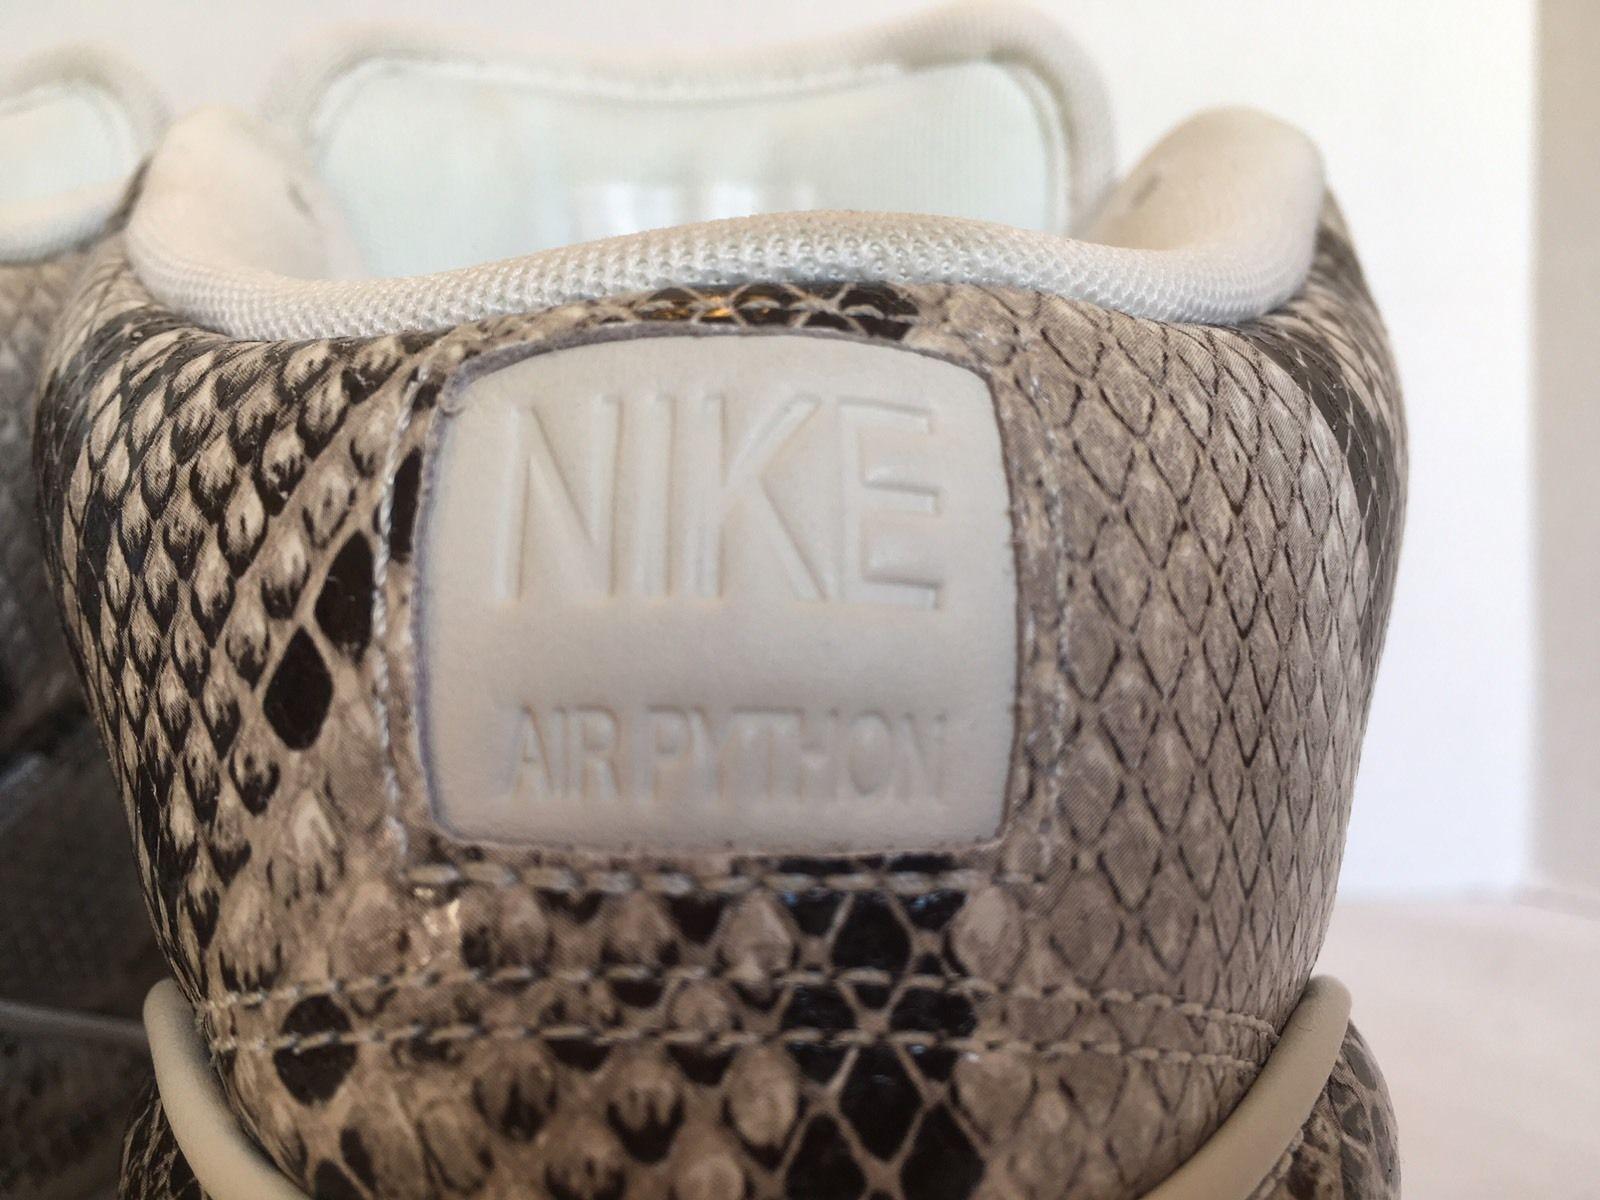 New Mens Nike Air Python PRM Snakeskin and 50 similar items